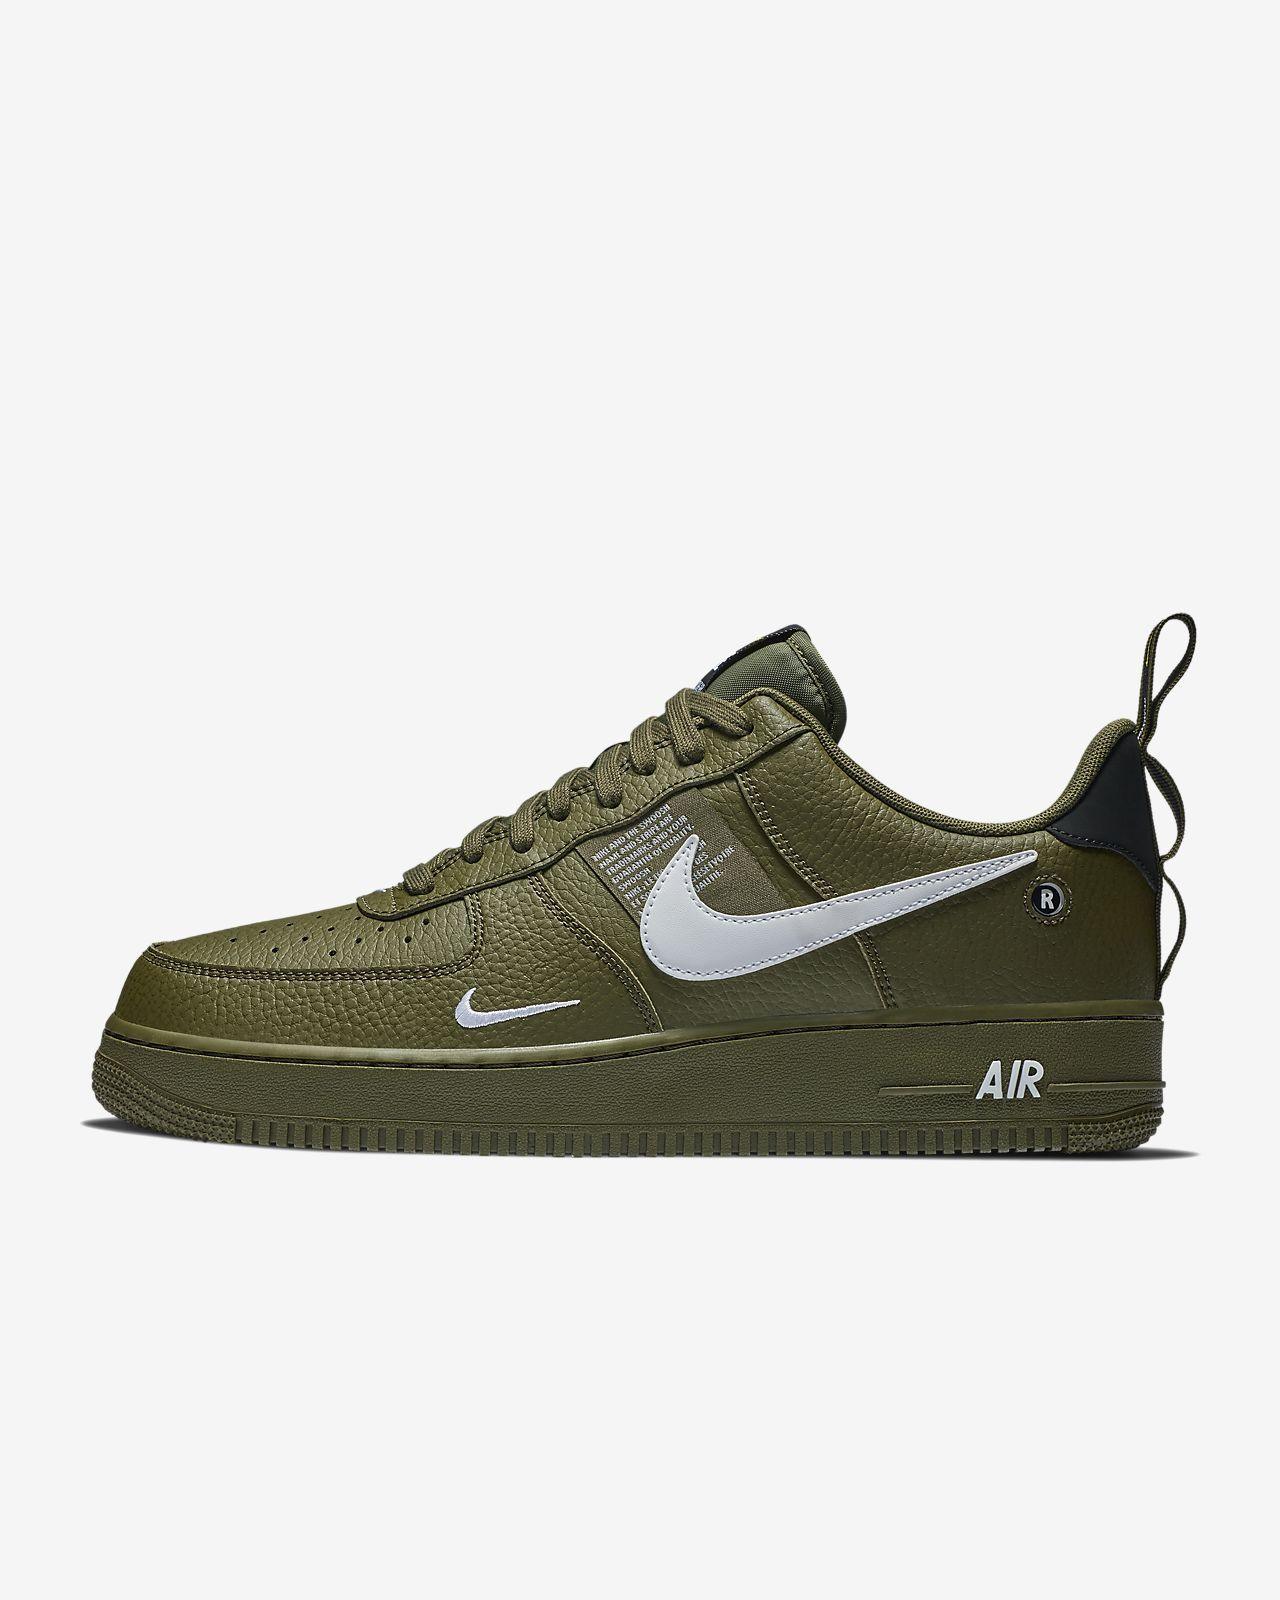 Nike Air Force 1 '07 LV8 Utility Men's